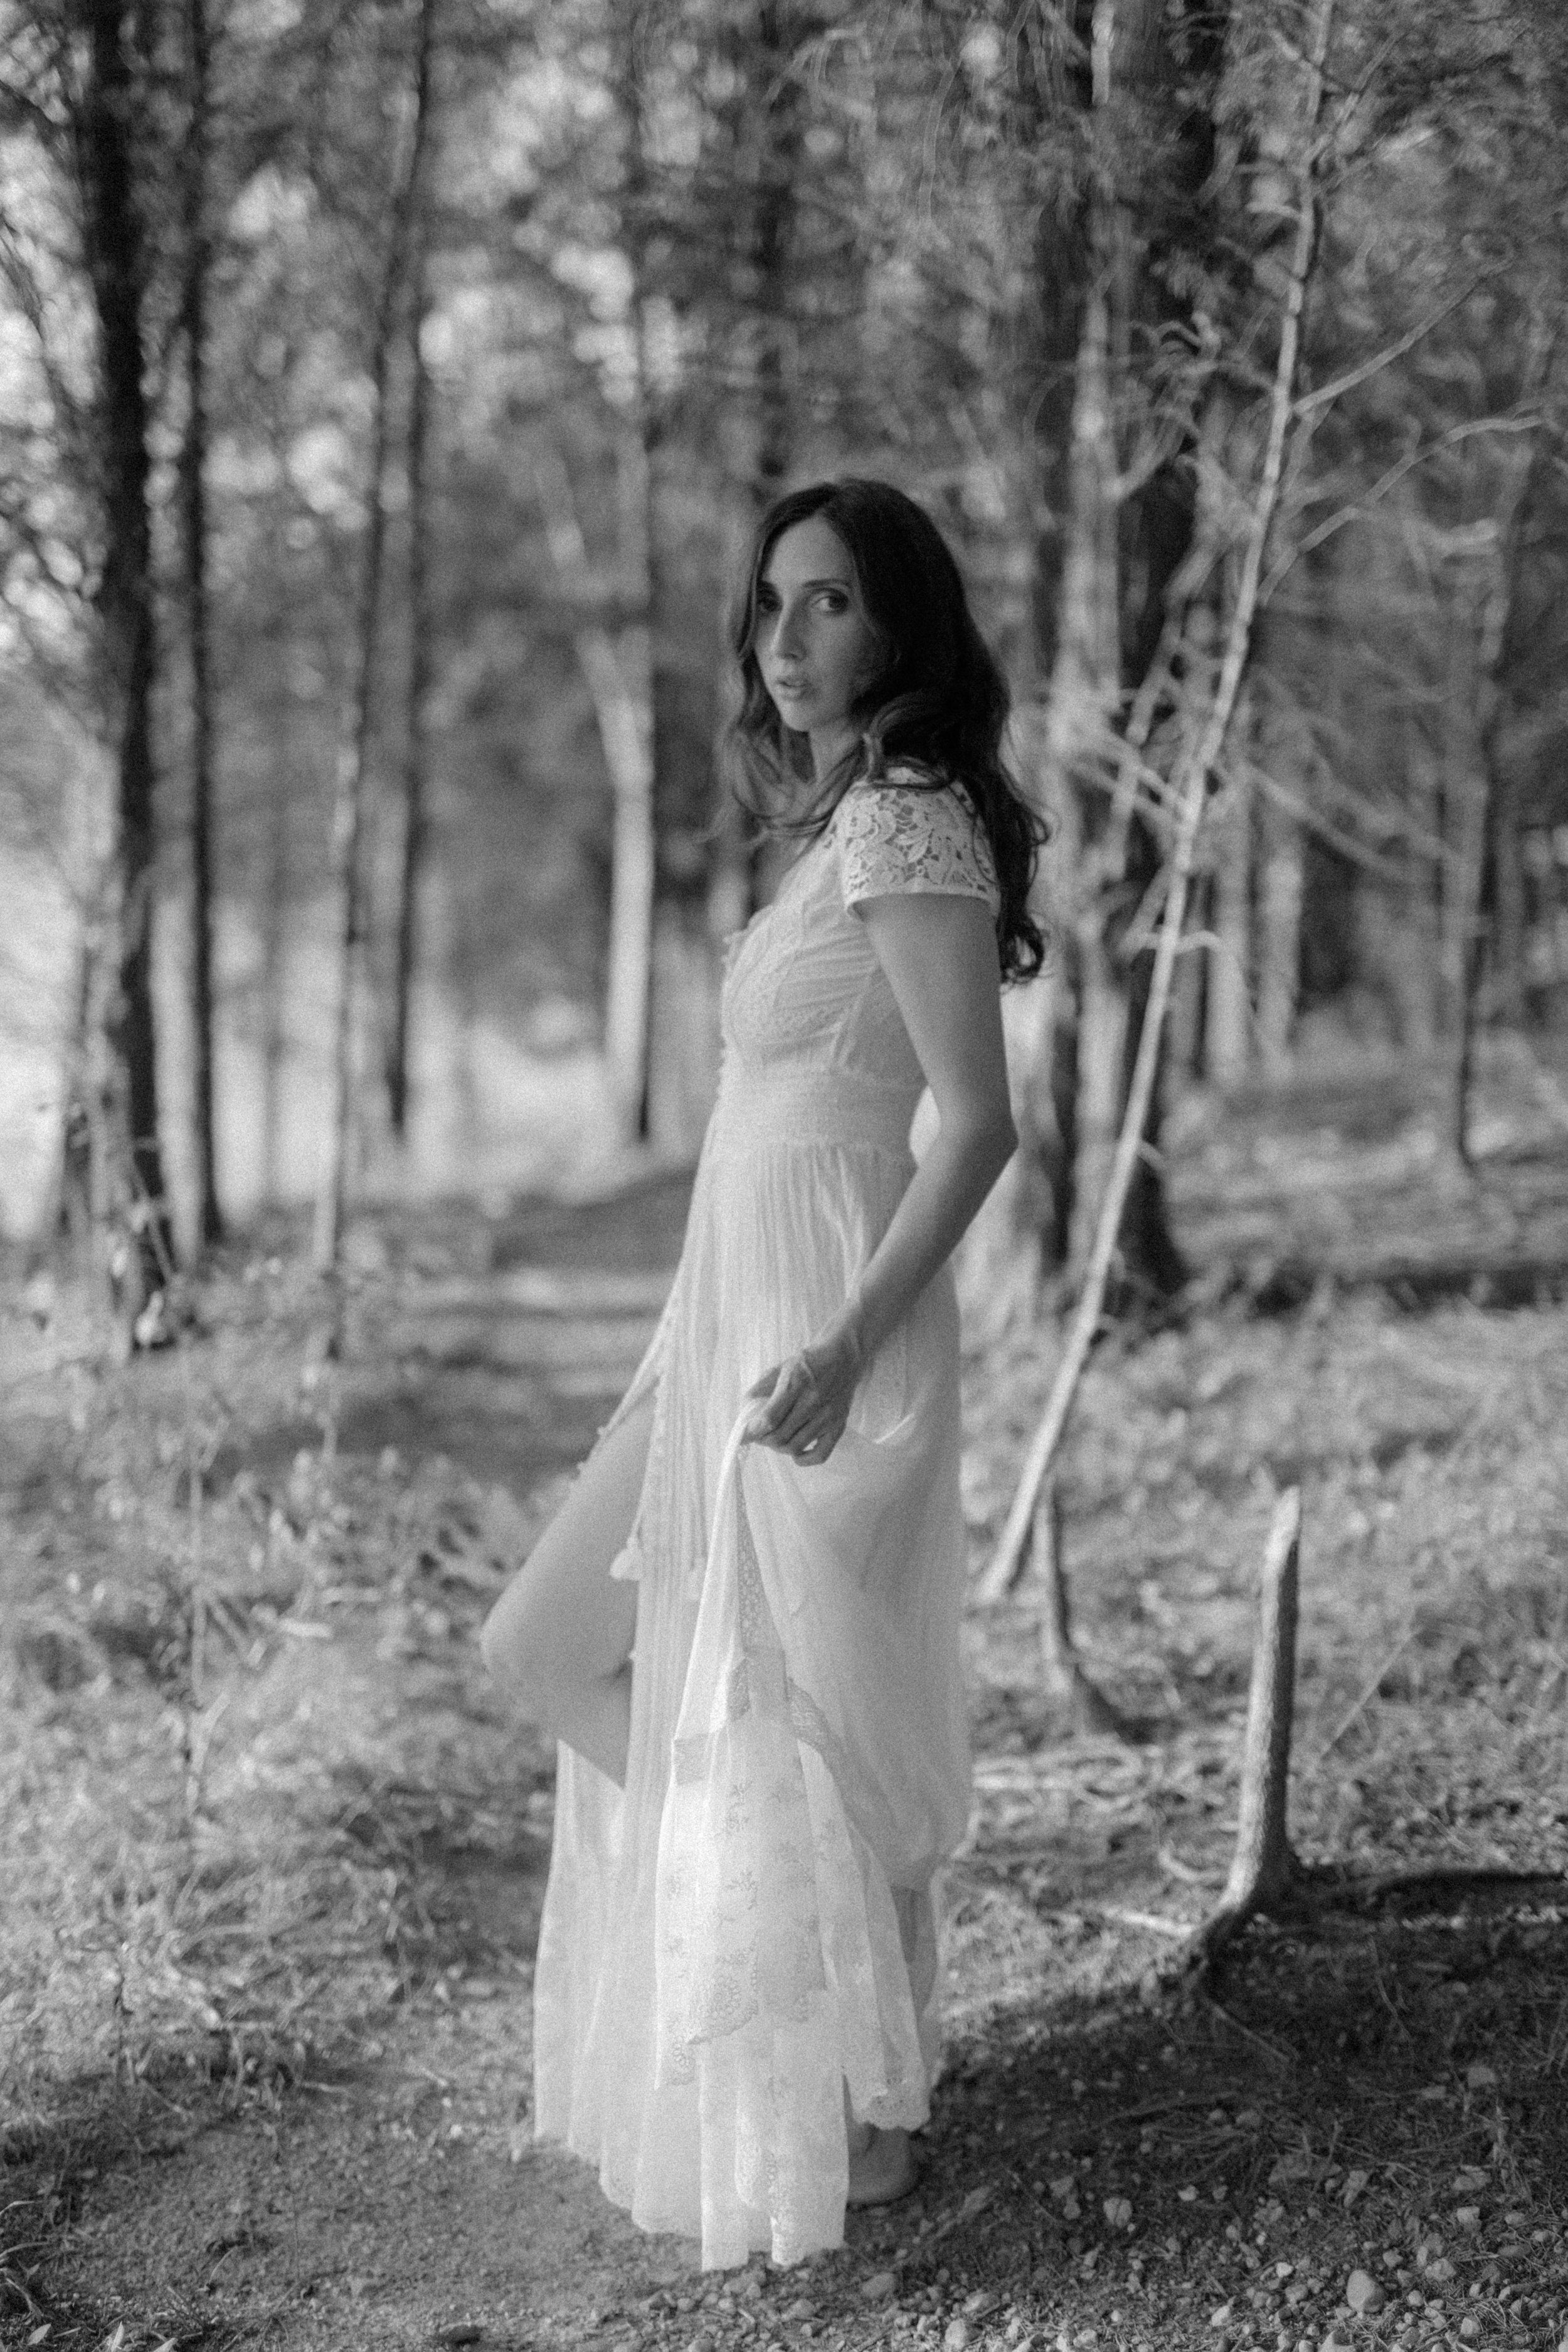 bohemian portrait session. bohemian style. boho maxi dress. ohio art model. anoushanou. ohio portrait photographer. sarah rose photography. i am sarah rose.